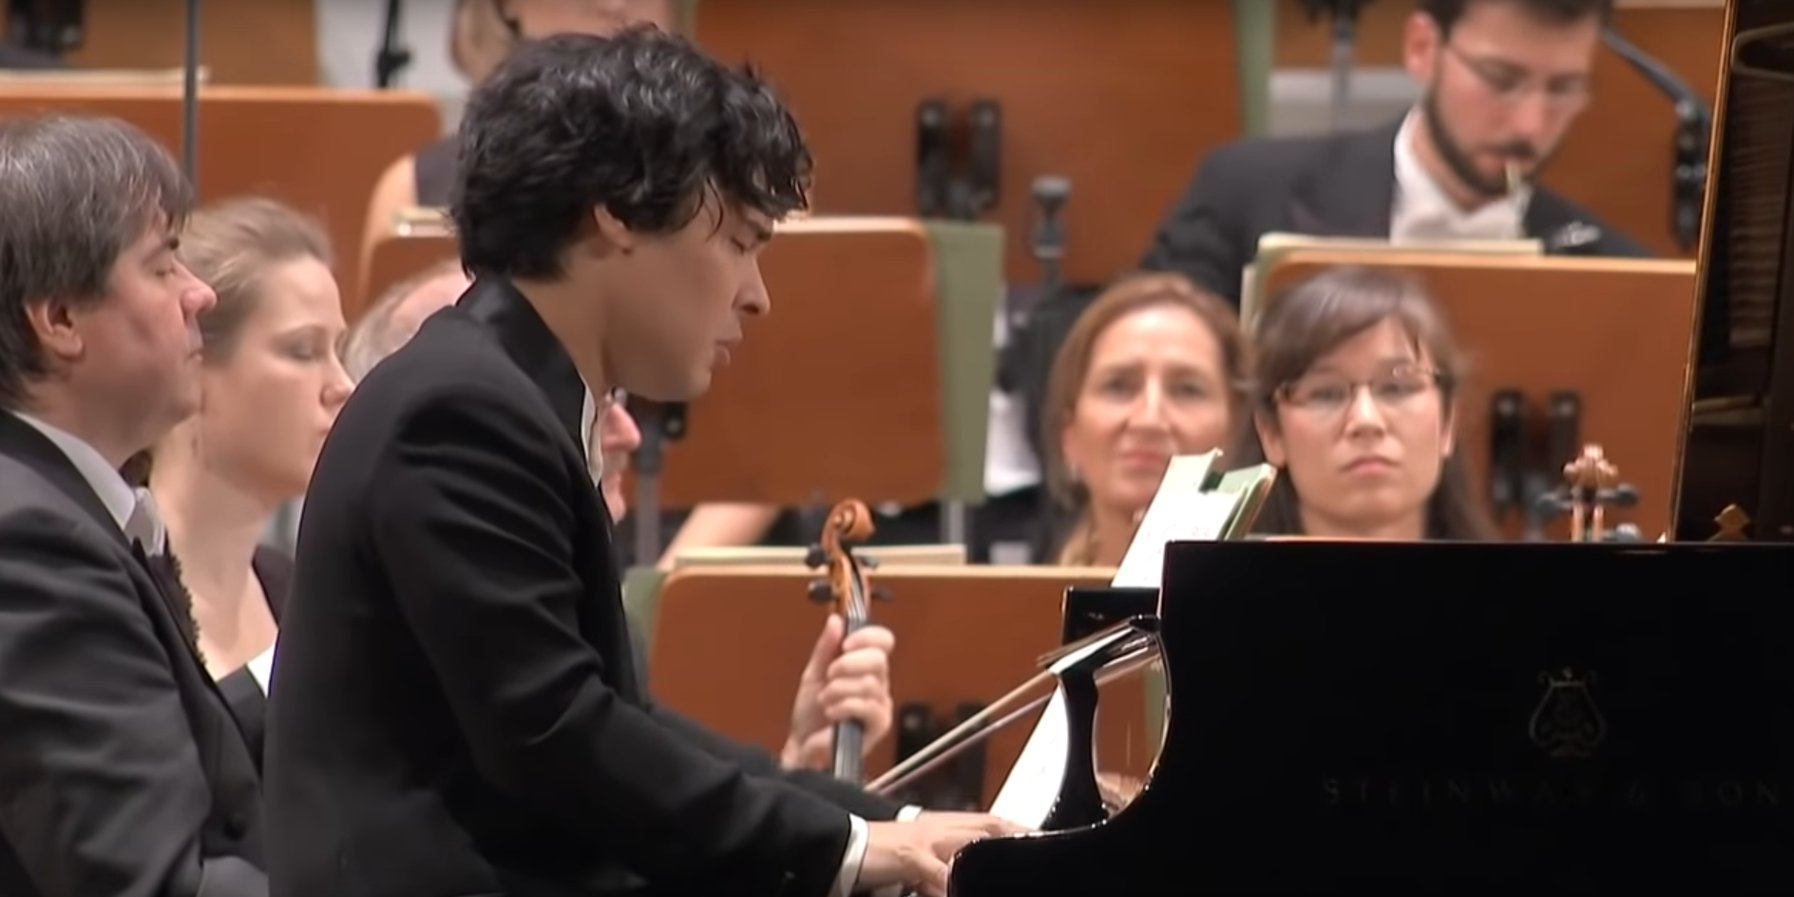 Klavierkonzert d-Moll KV 466 / Kadenz (Christopher Park)